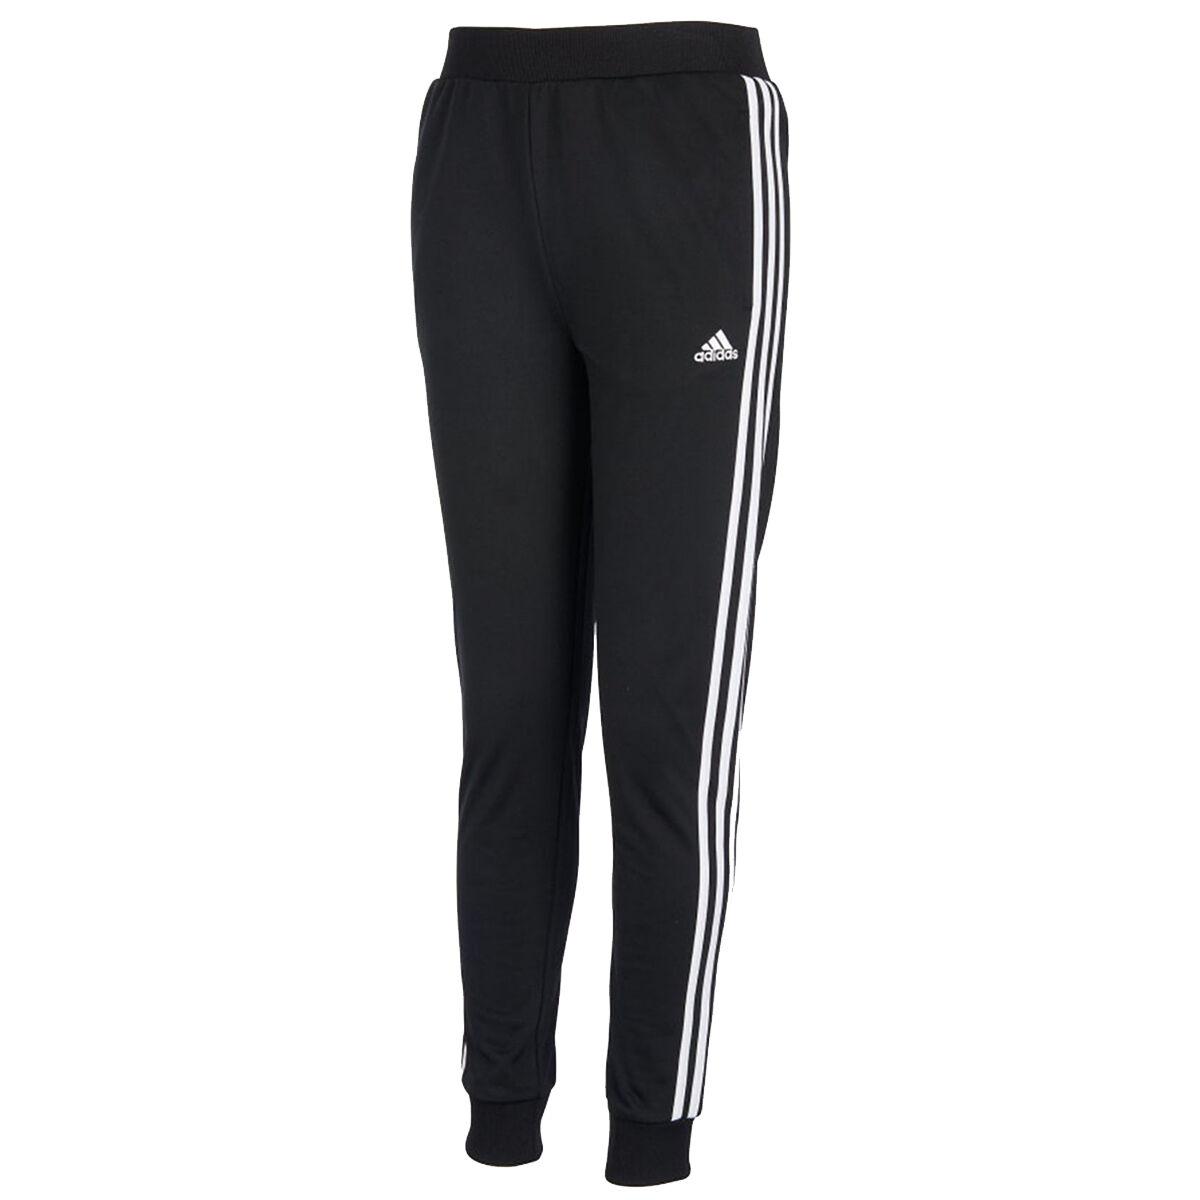 Adidas Girls' Tricot Jogger Pants - Black, M